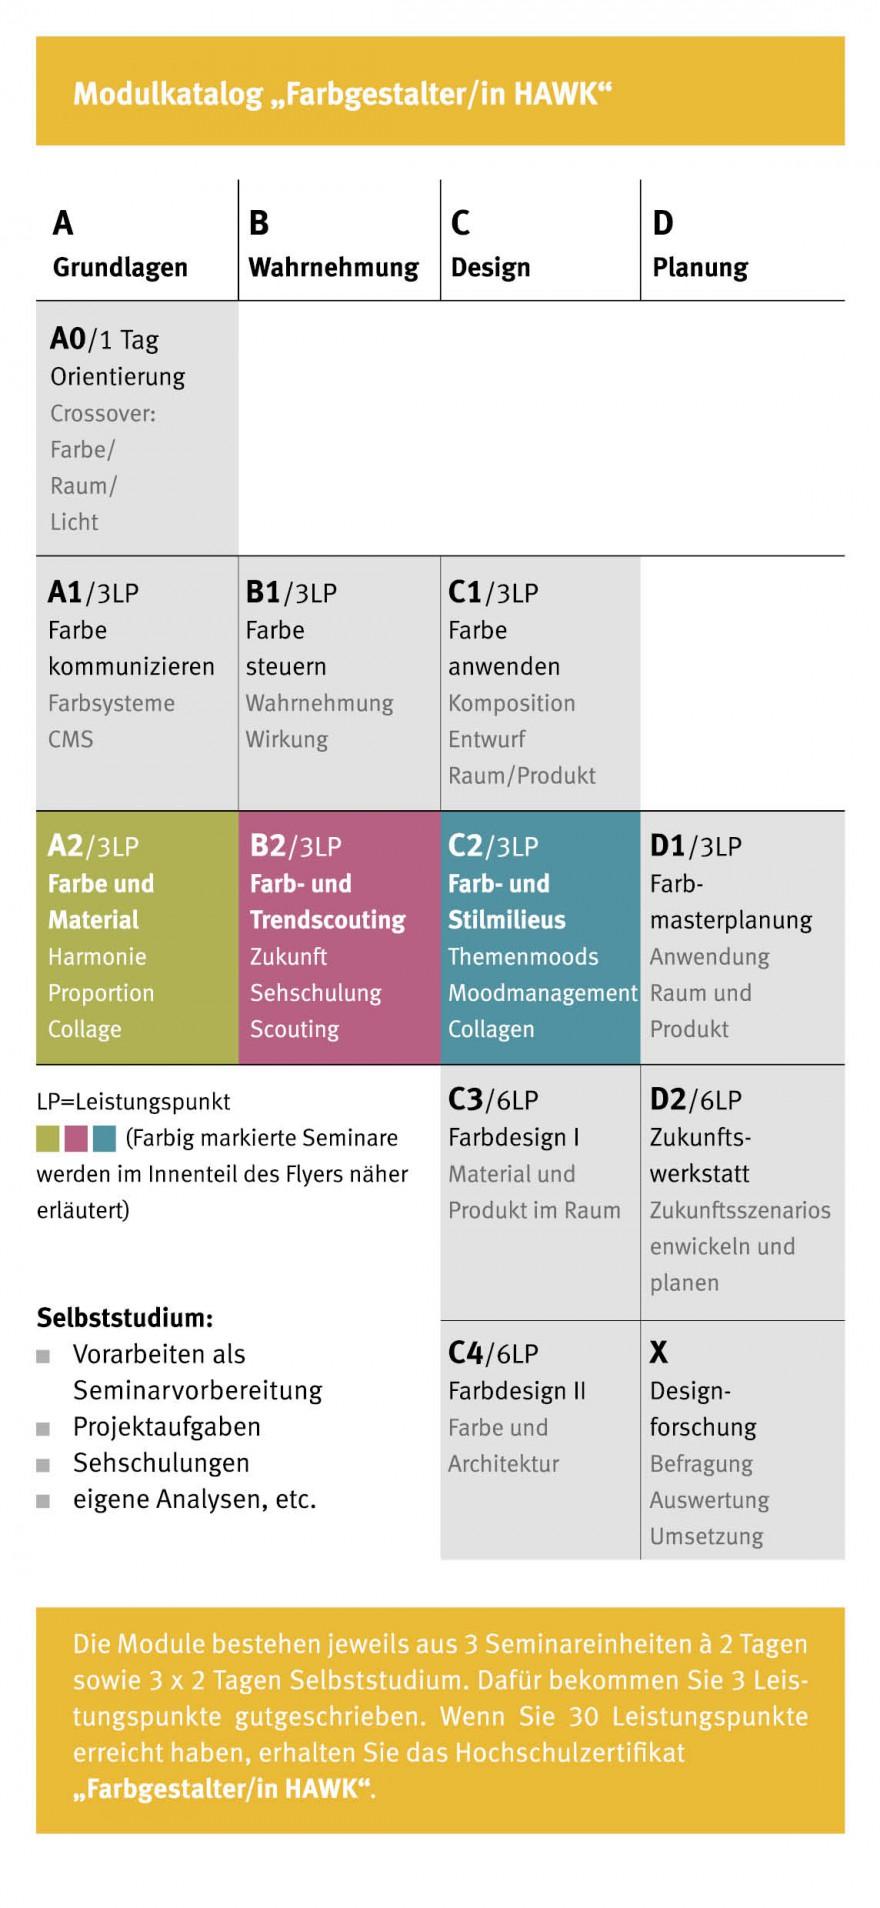 Modulkatalog_Weiterbildung_Farbdesign